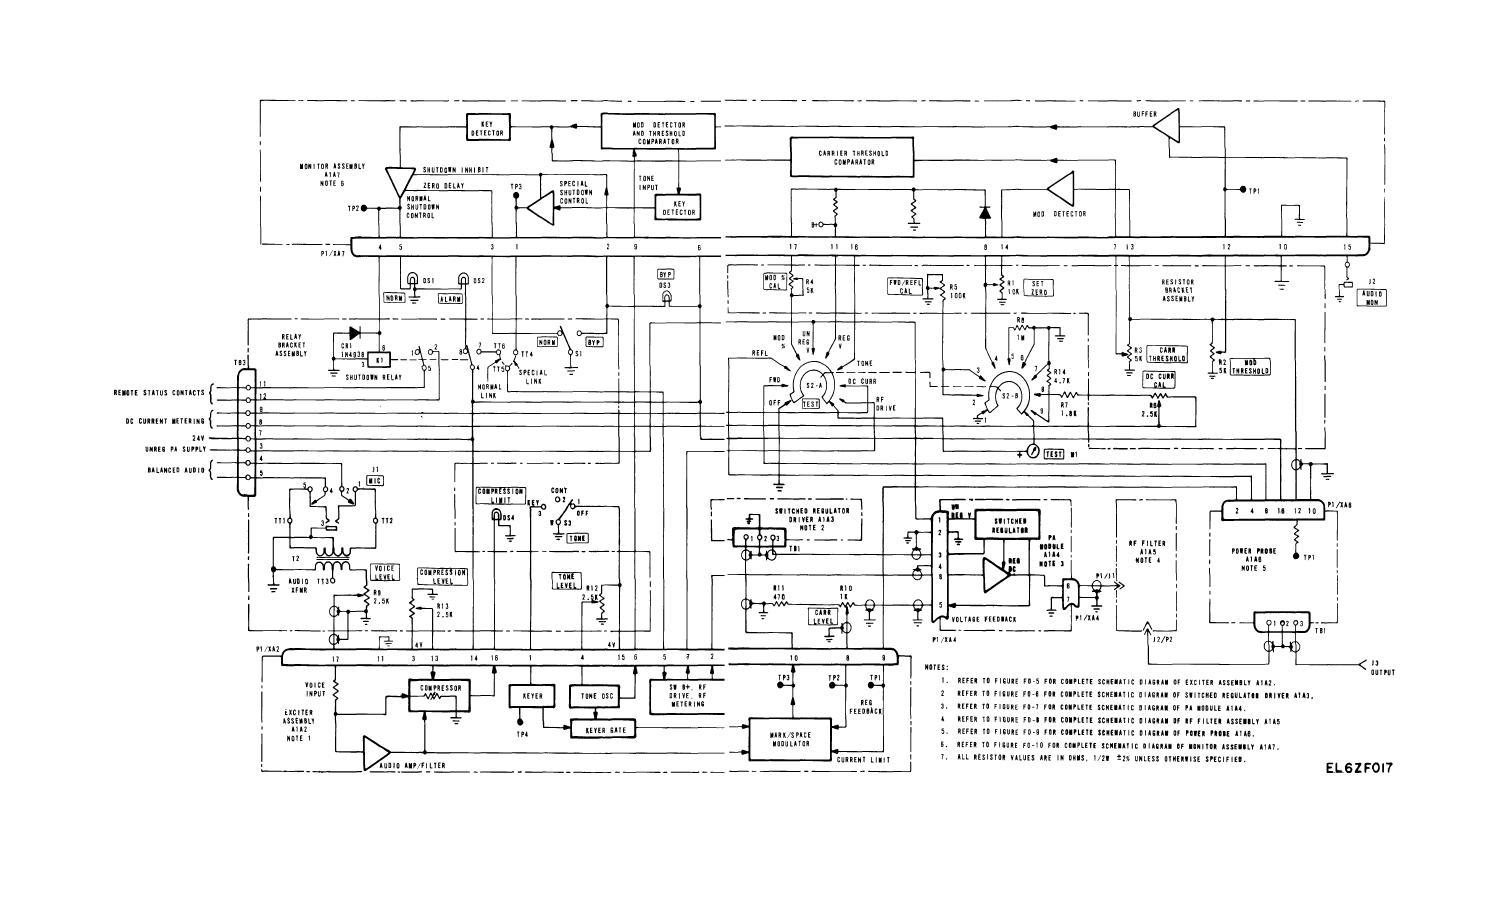 FO 2 NDB Transmitter Interconnection Diagram